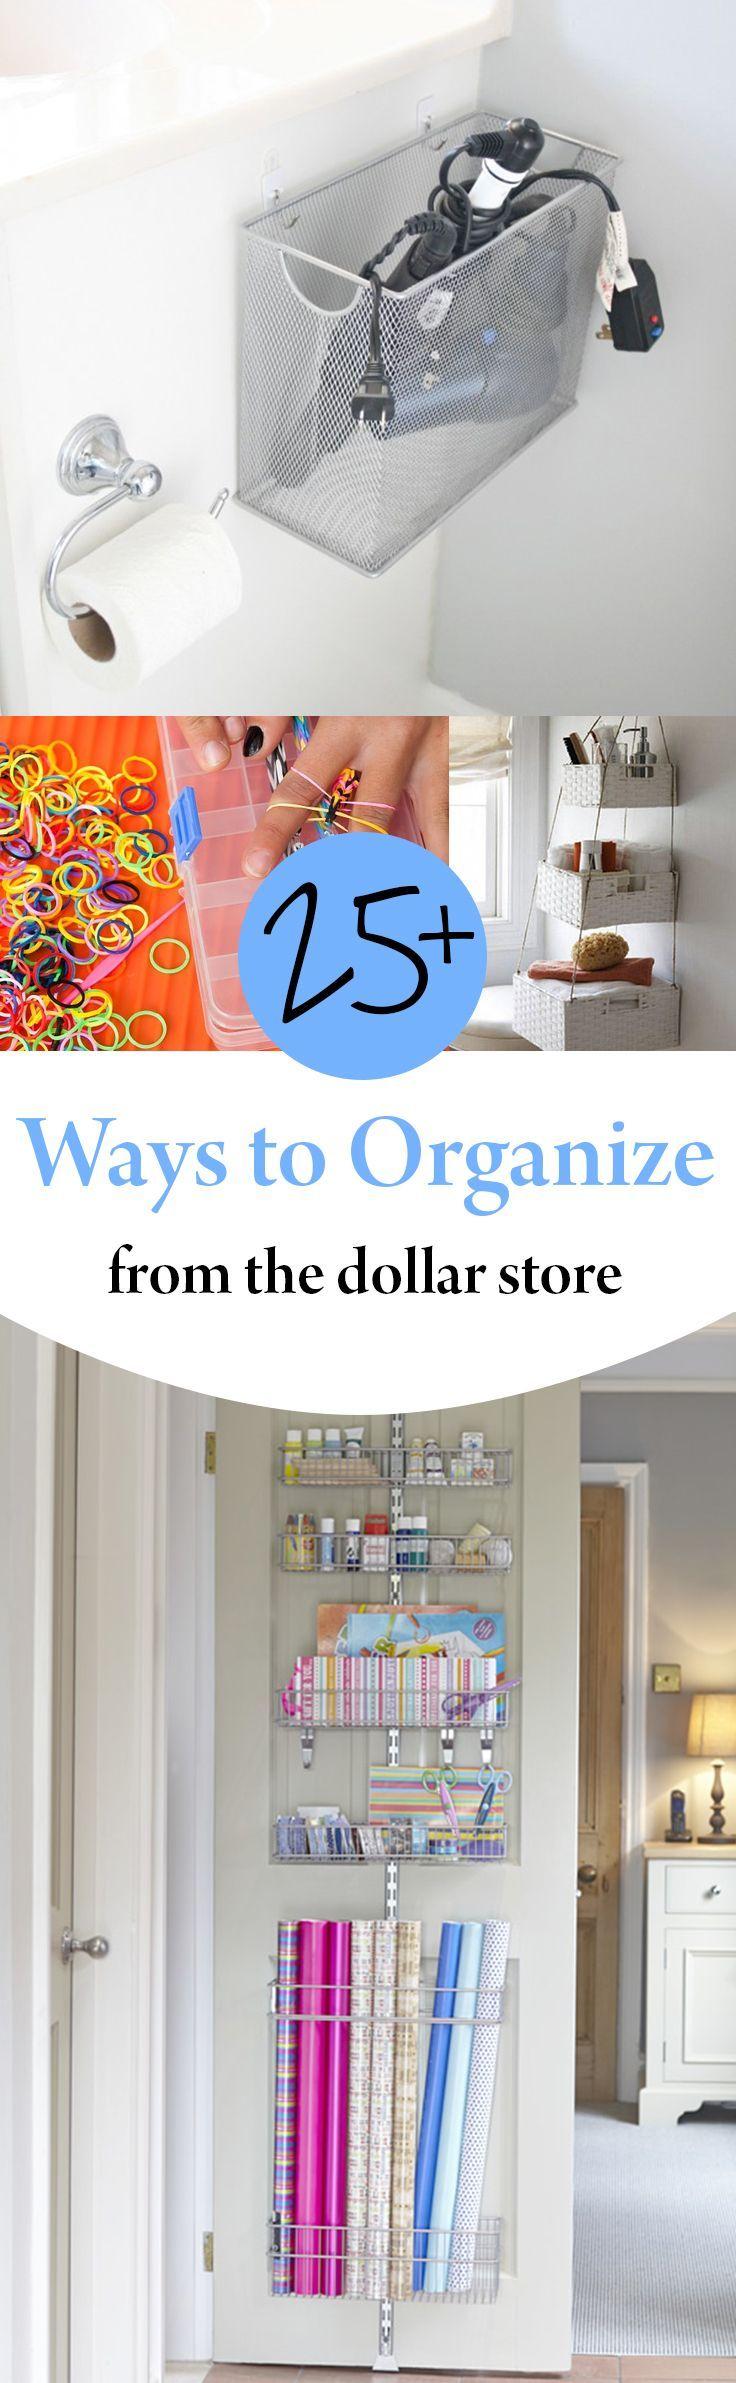 Organization Dollar Store Organization Hacks Home Organization Tips And Tricks Frugal Home Organization Home Organization Home Organization Hacks